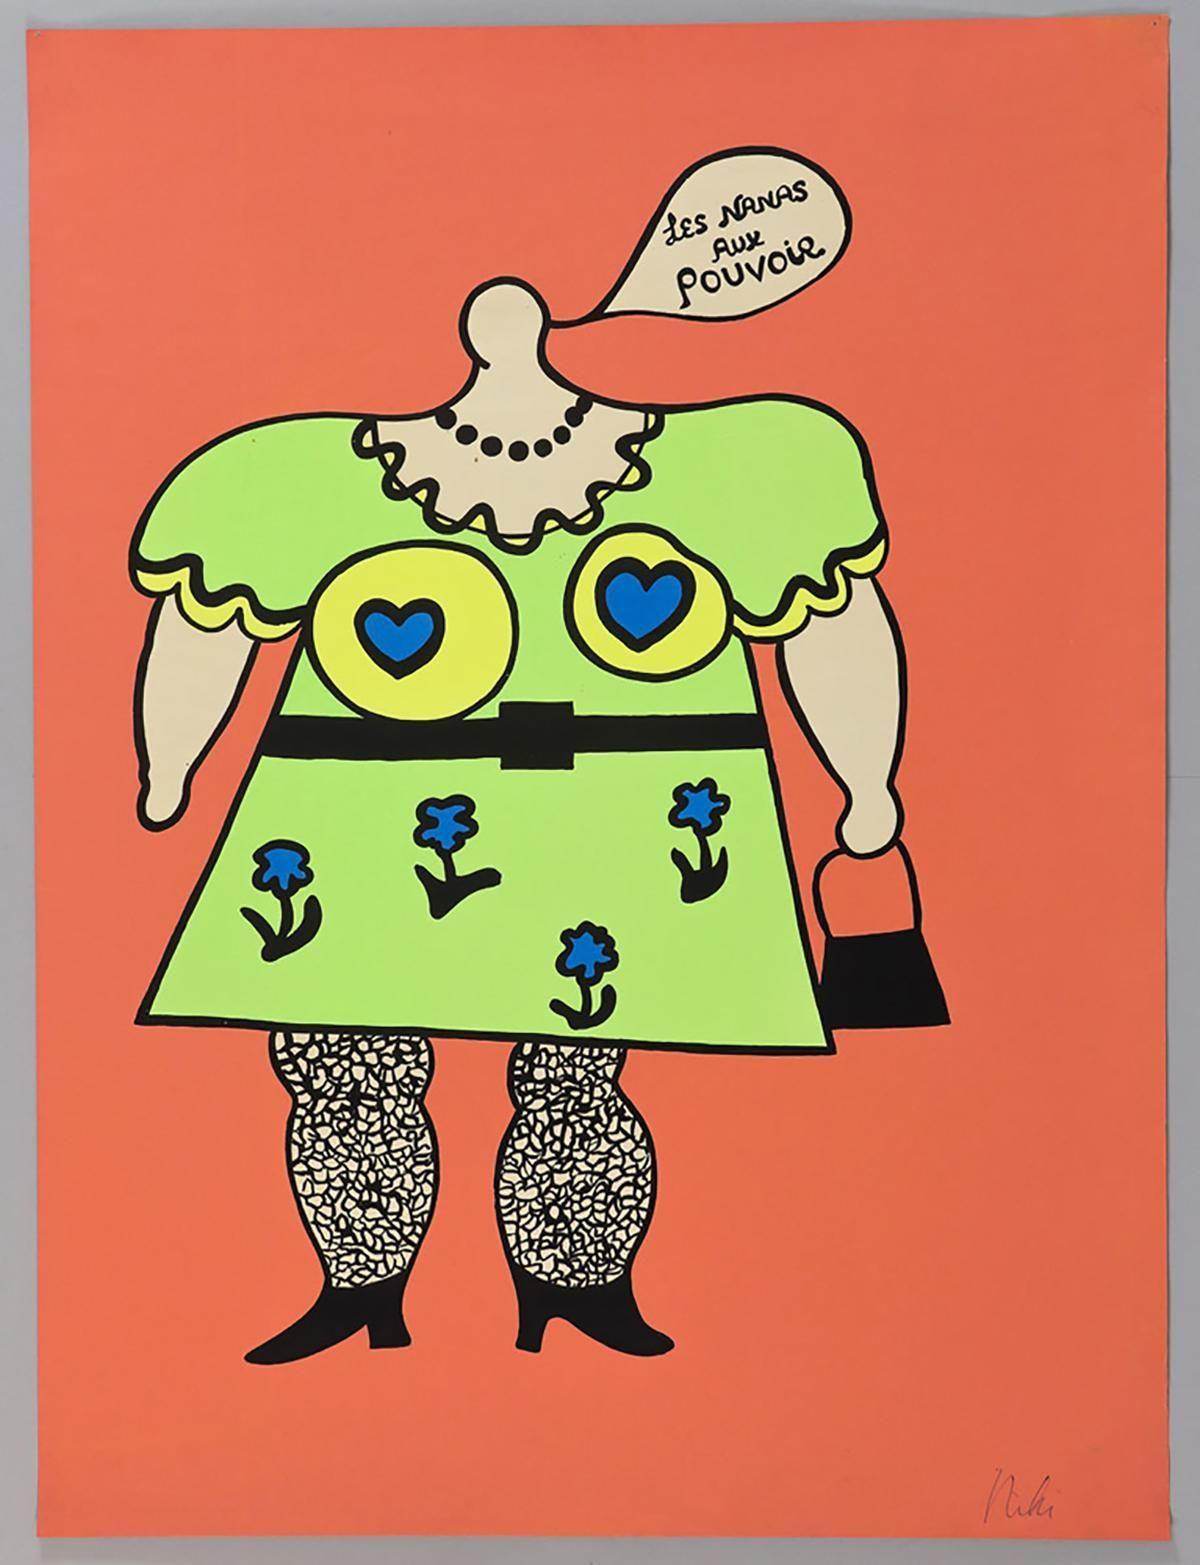 Niki de Saint Phalle - Les Nanas aux pouvoir, 1965